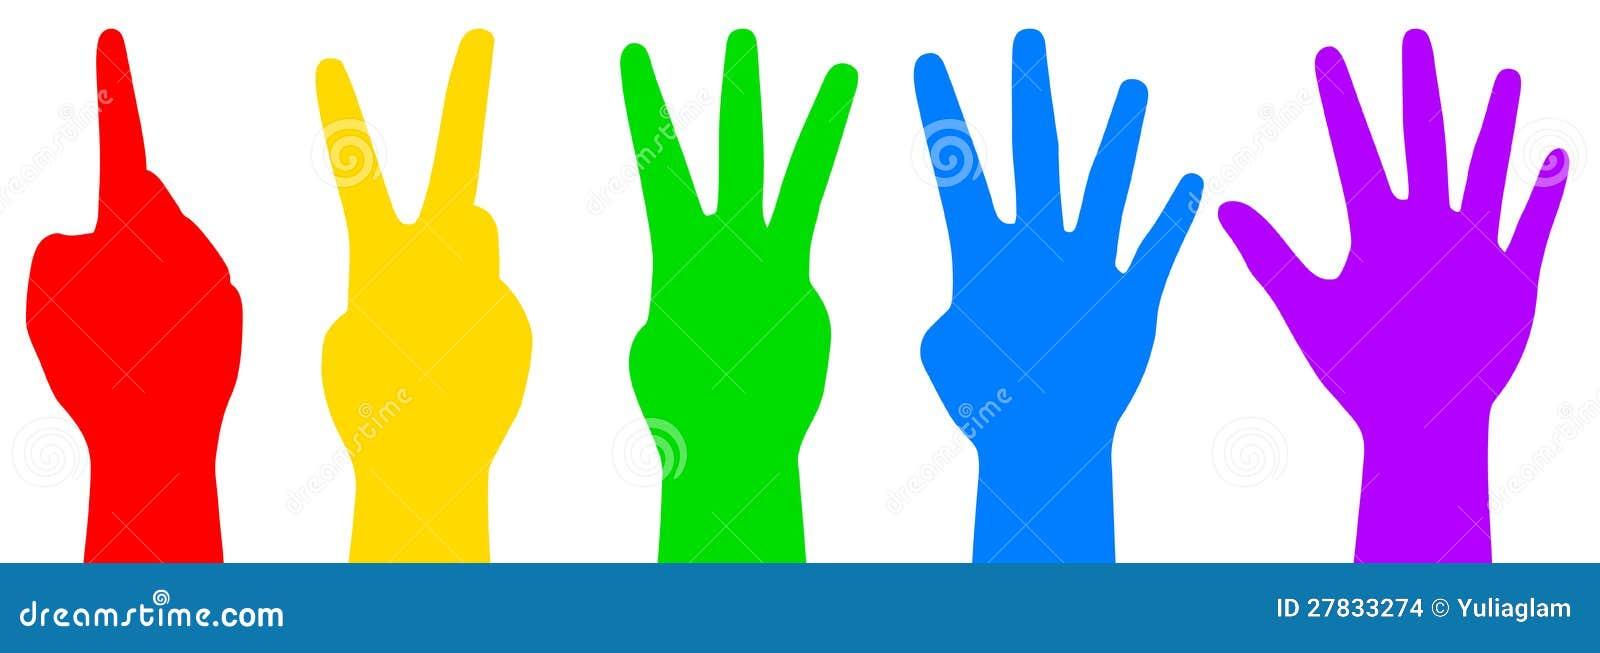 Maos De Contagem Coloridas Ilustracao Do Vetor Ilustracao De